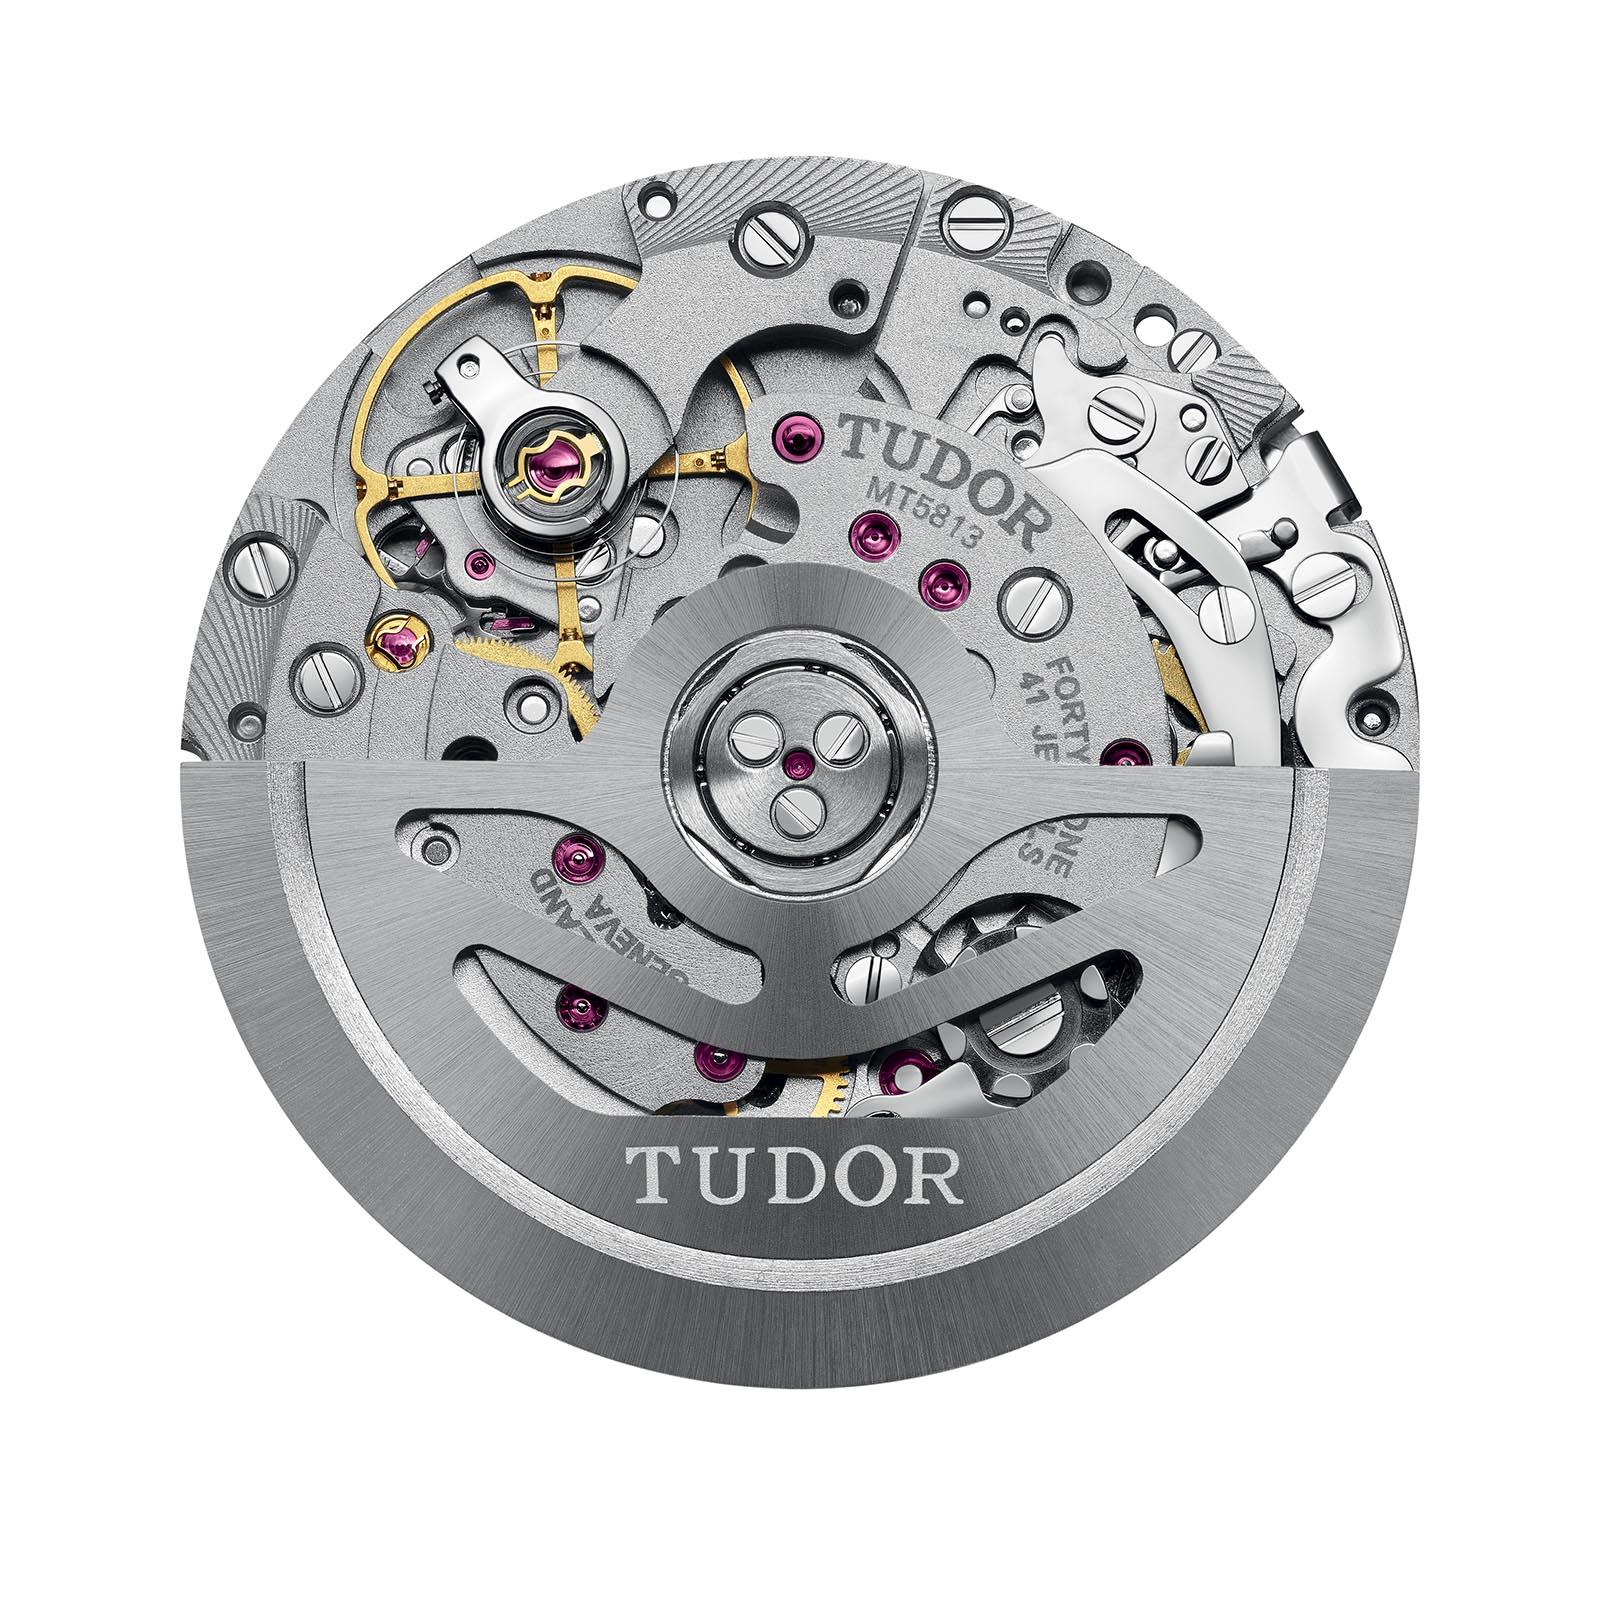 Tudor Black Bay Chronograph S&G 3